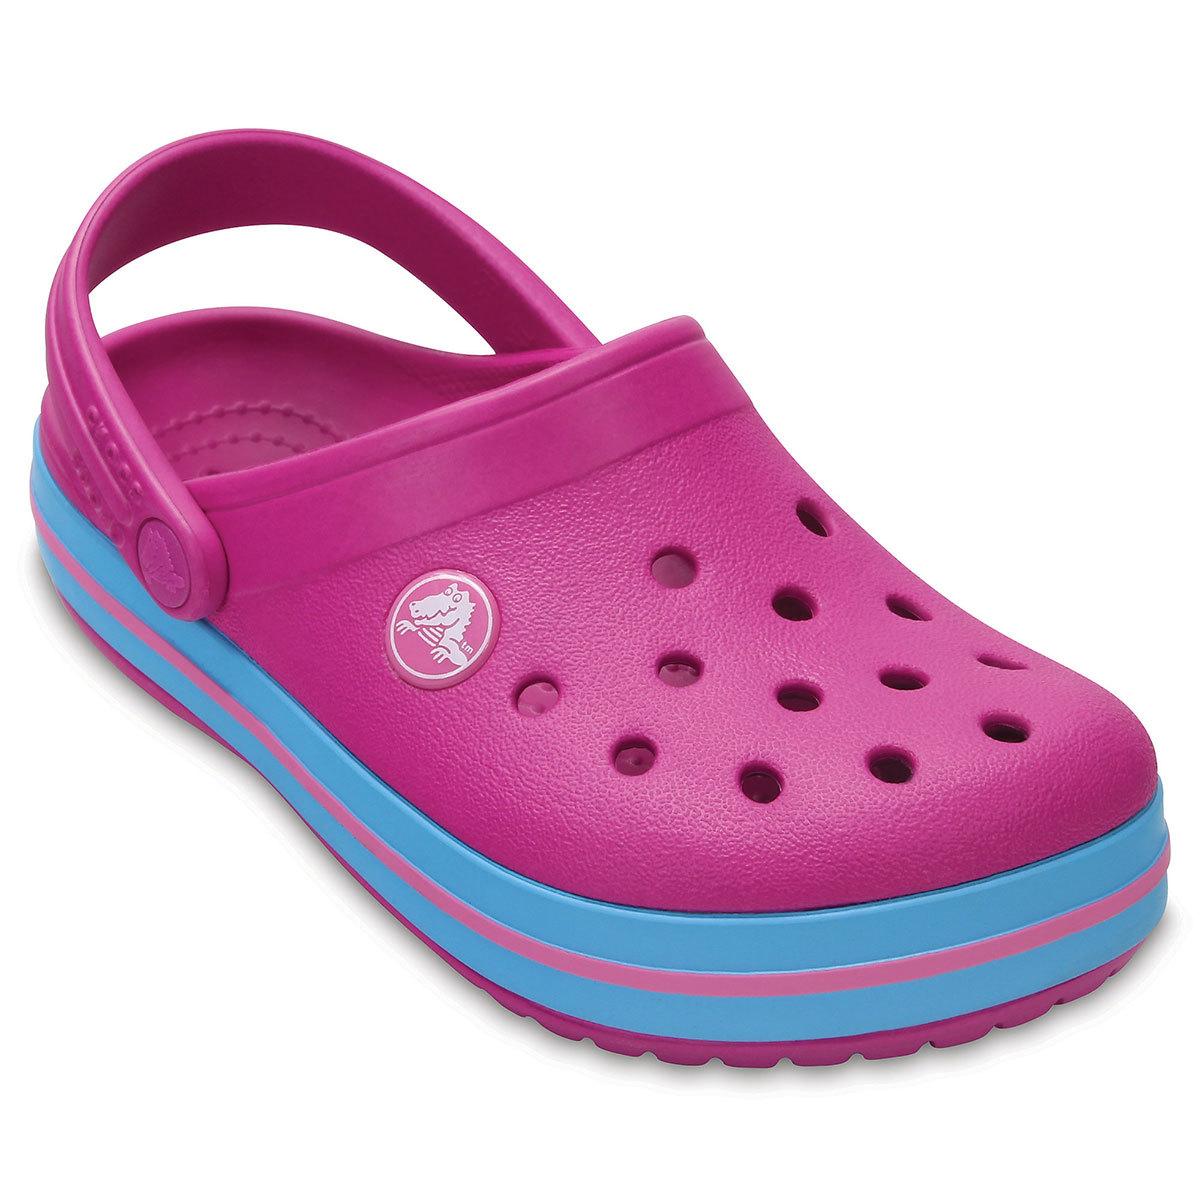 crocs shoes for girls crocs on sale